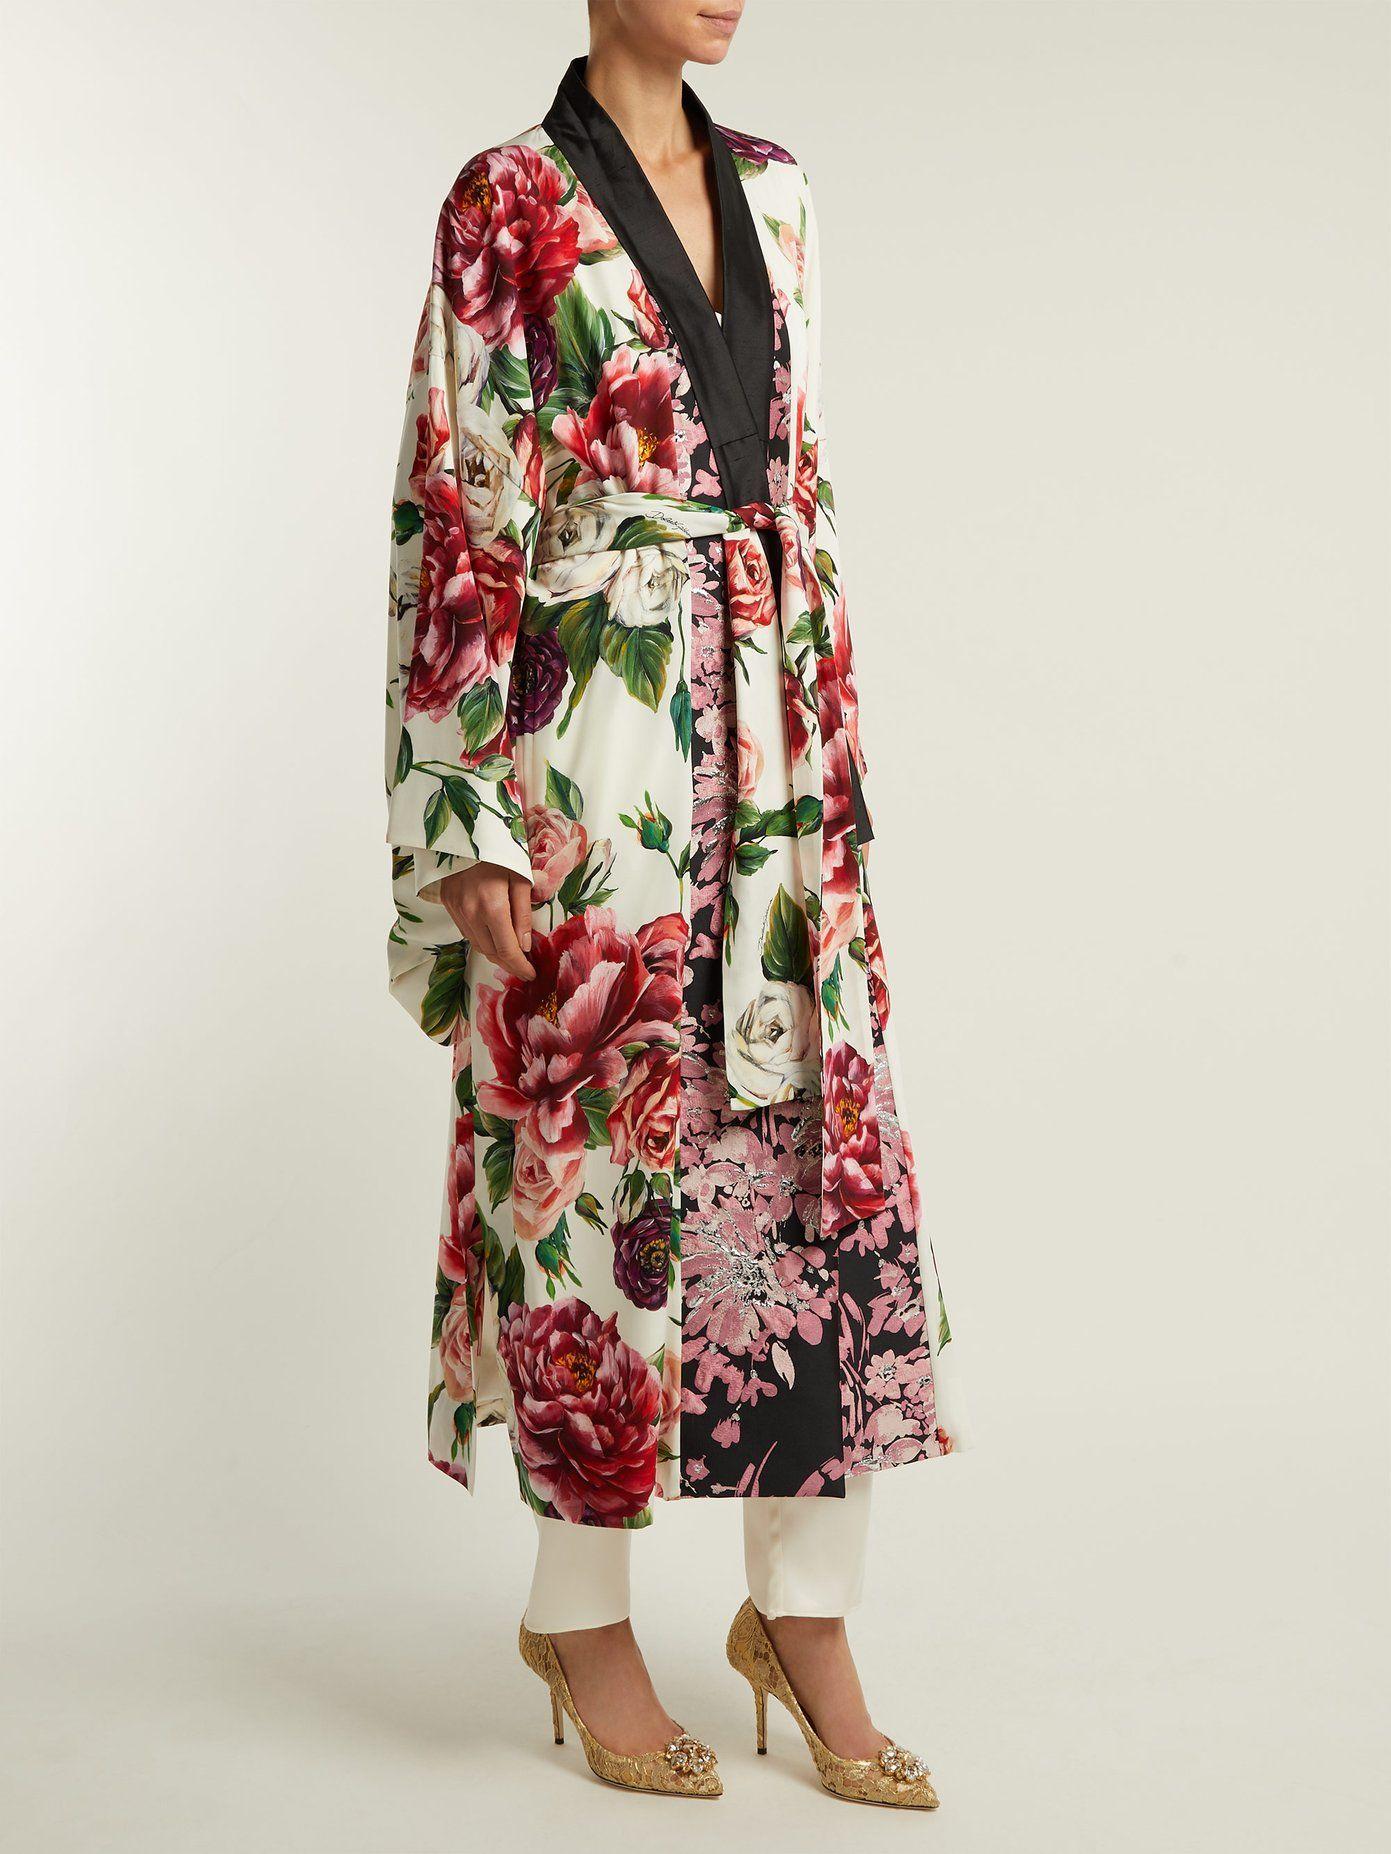 y Reino rosas con Abrigo estilo kimono com estampado Matchesfashion Unido de peoníaDolce Gabbana xqxYfOw